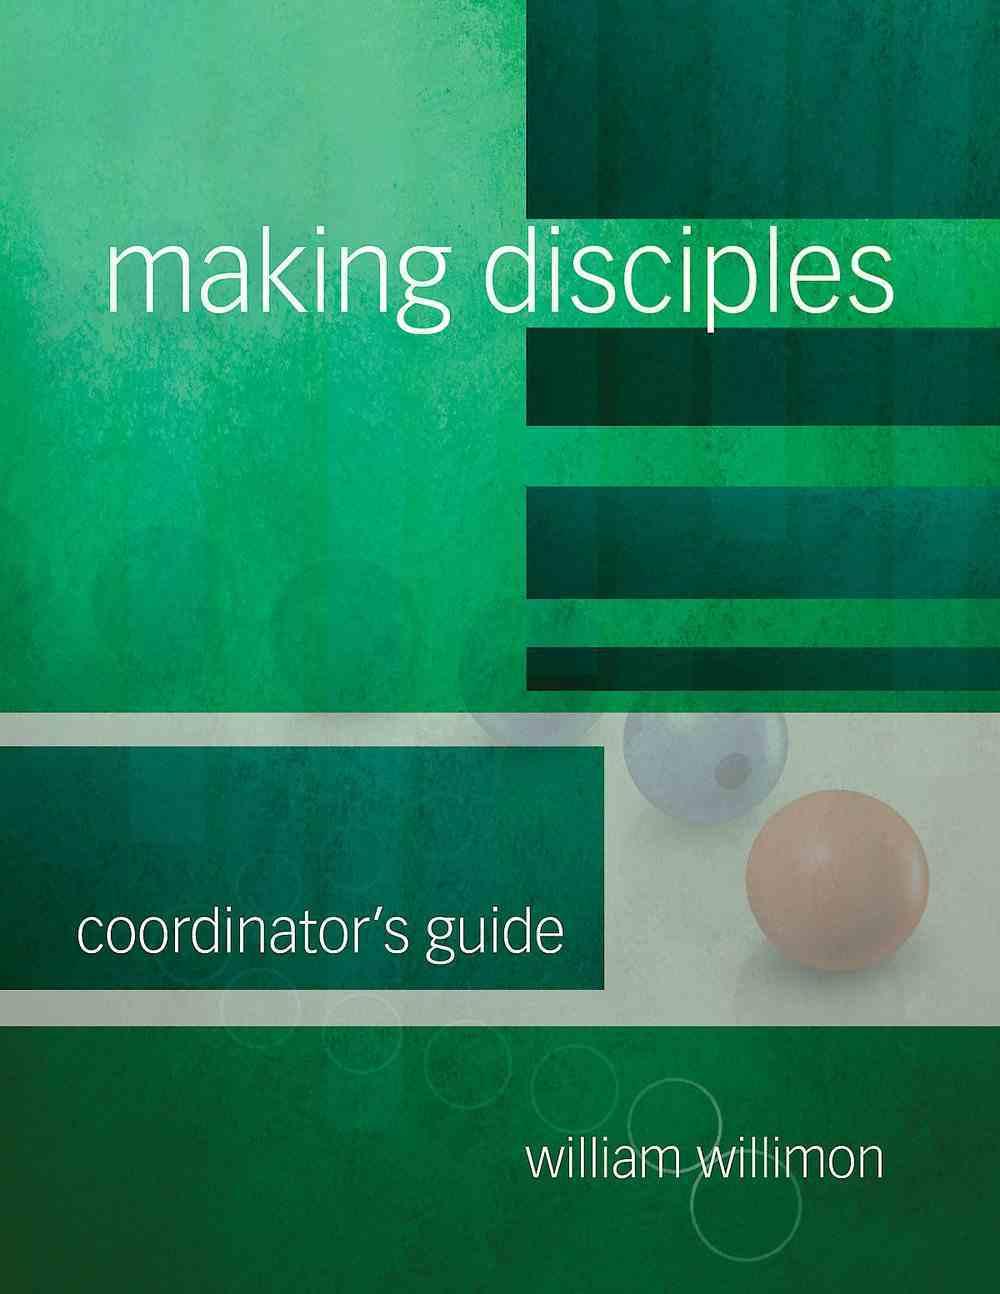 Making Disciples: Coordinator's Guide eBook